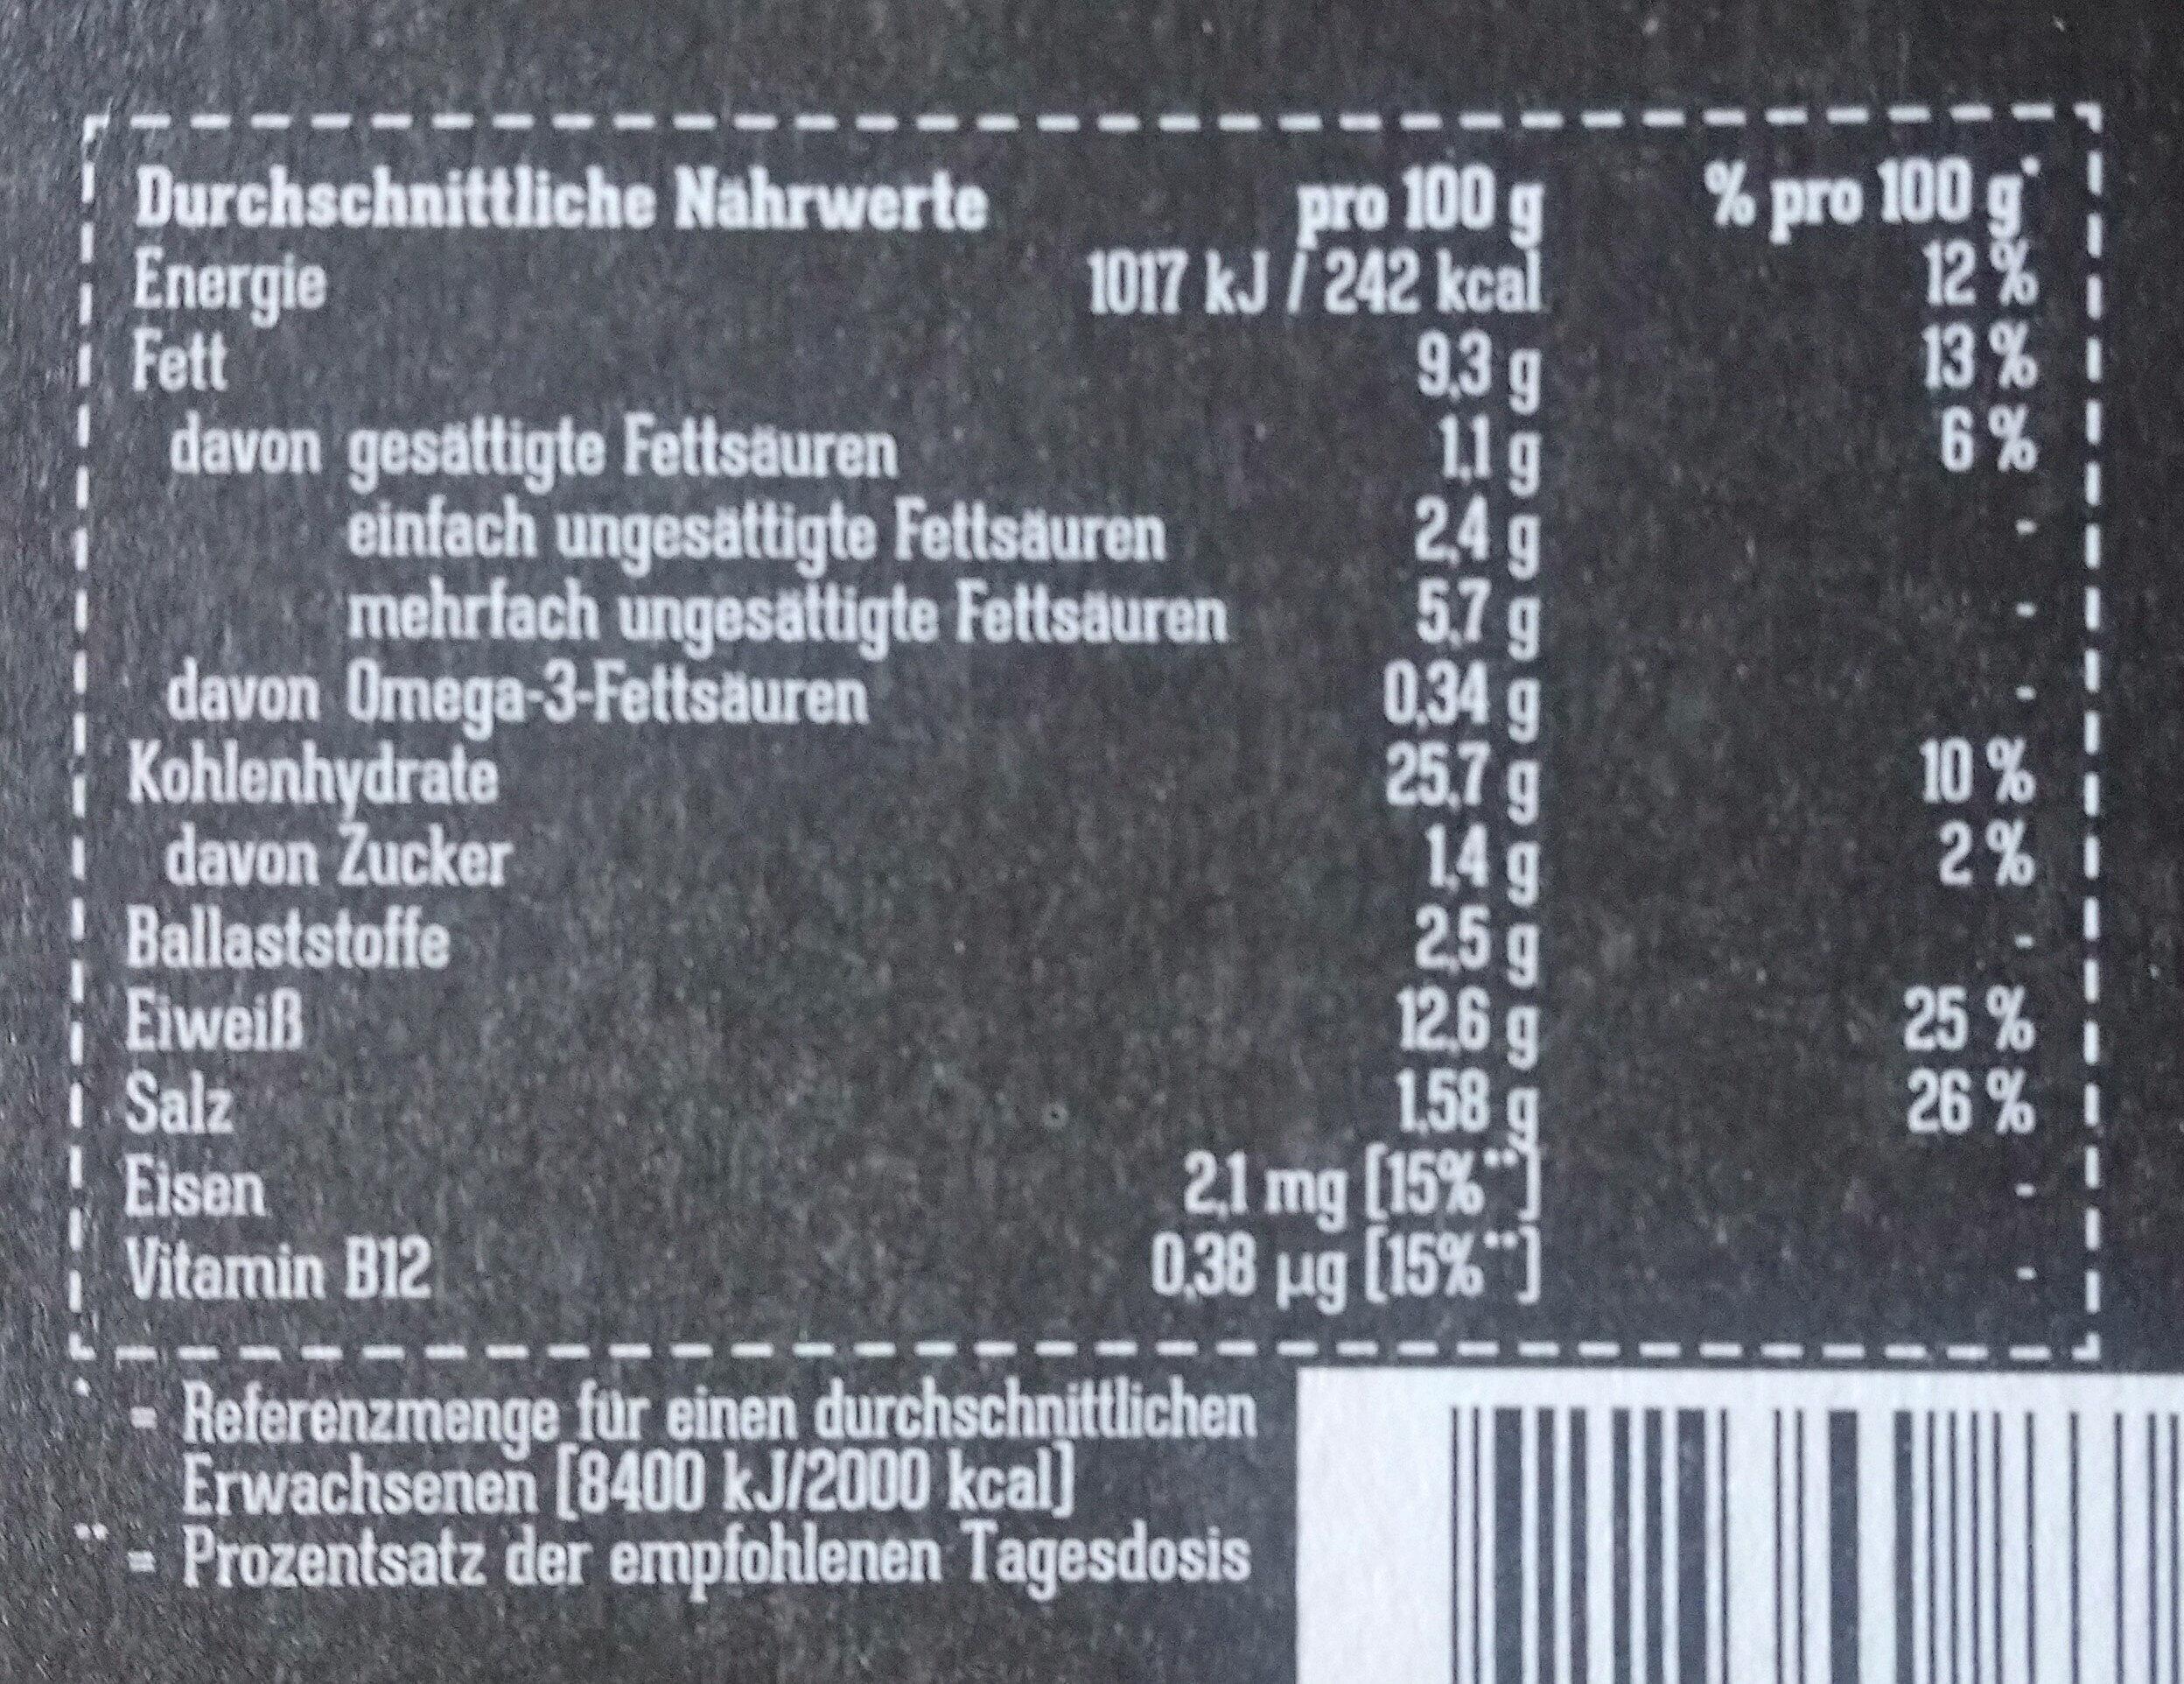 Stick de poissons vegan - Valori nutrizionali - de